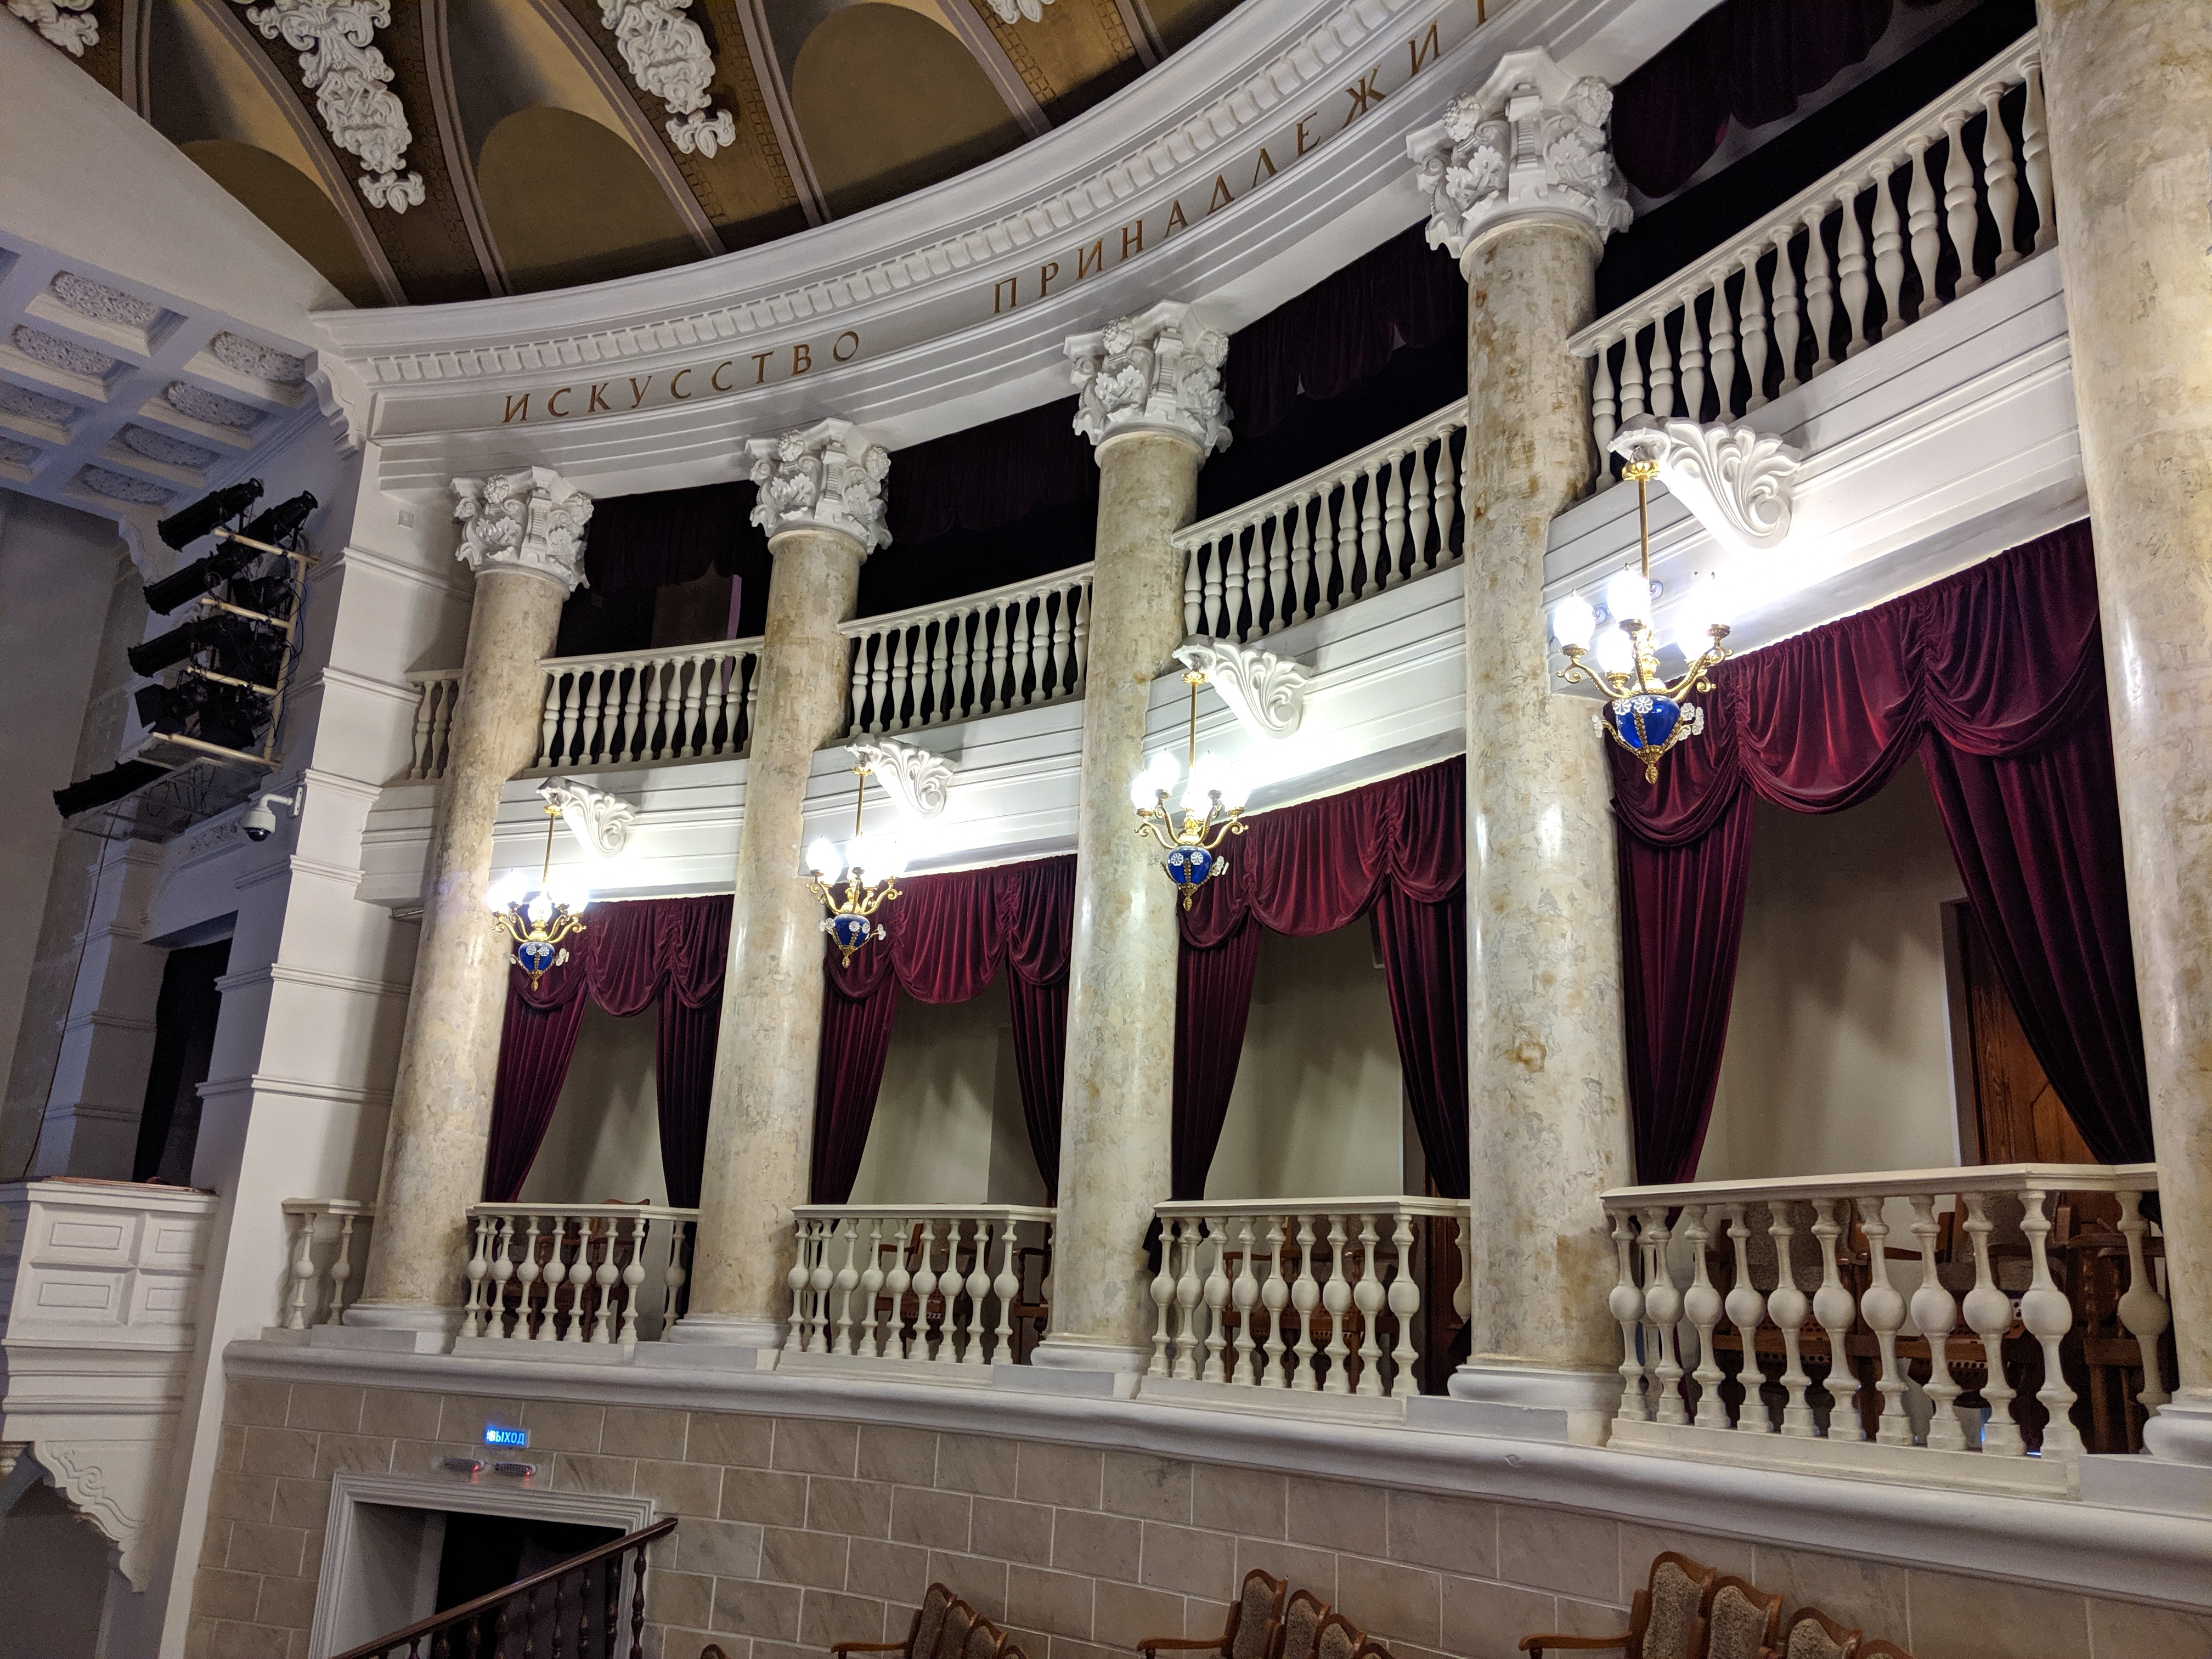 Auditorium inside the Buryat State Academic Opera and Ballet Theatre